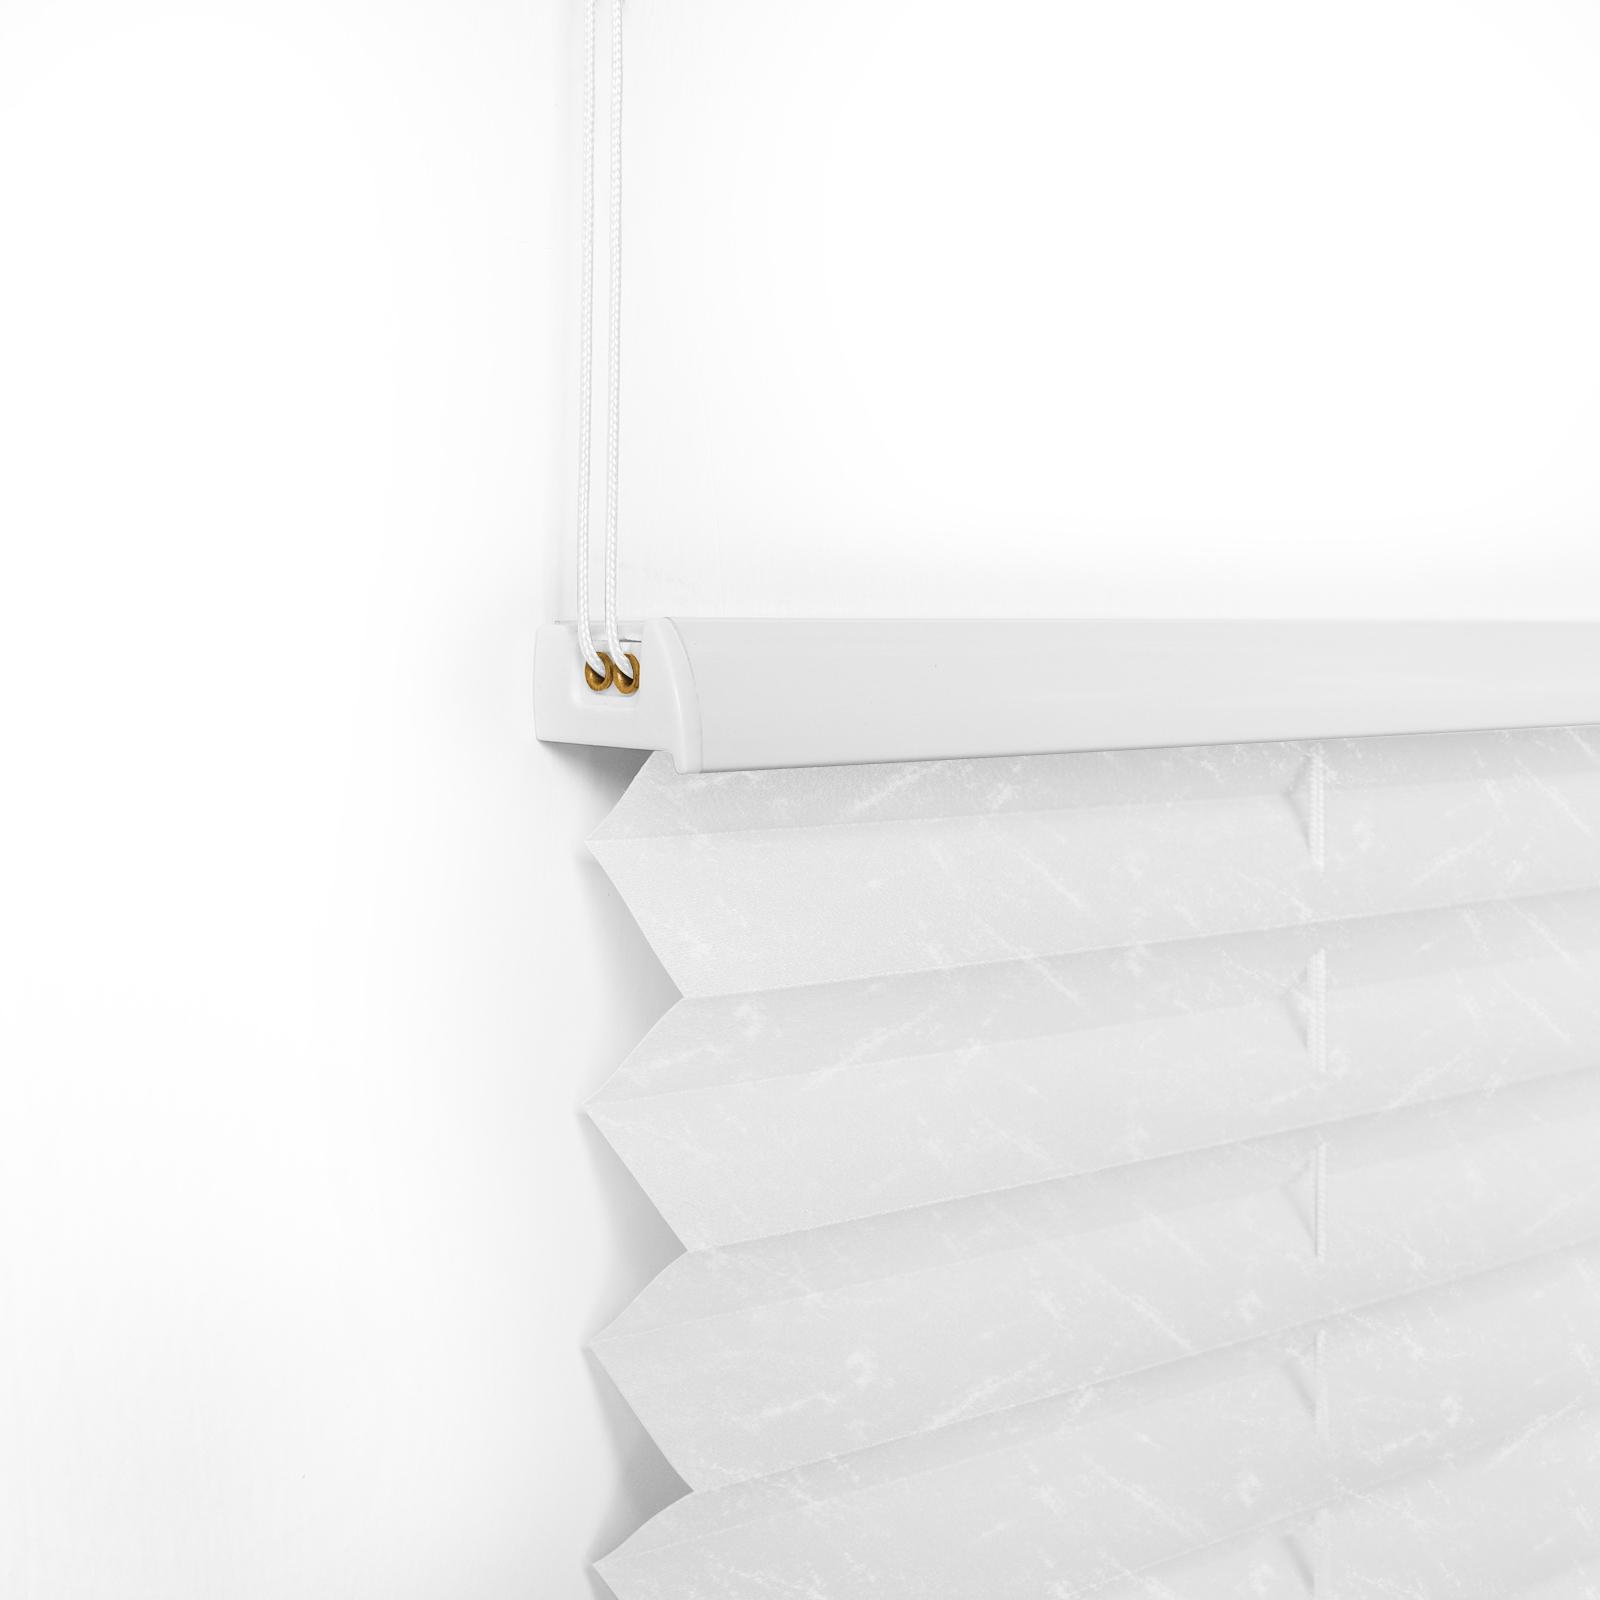 klemmfix plissee fenster faltrollo ohne bohren plisseerollos wei blickdicht ebay. Black Bedroom Furniture Sets. Home Design Ideas